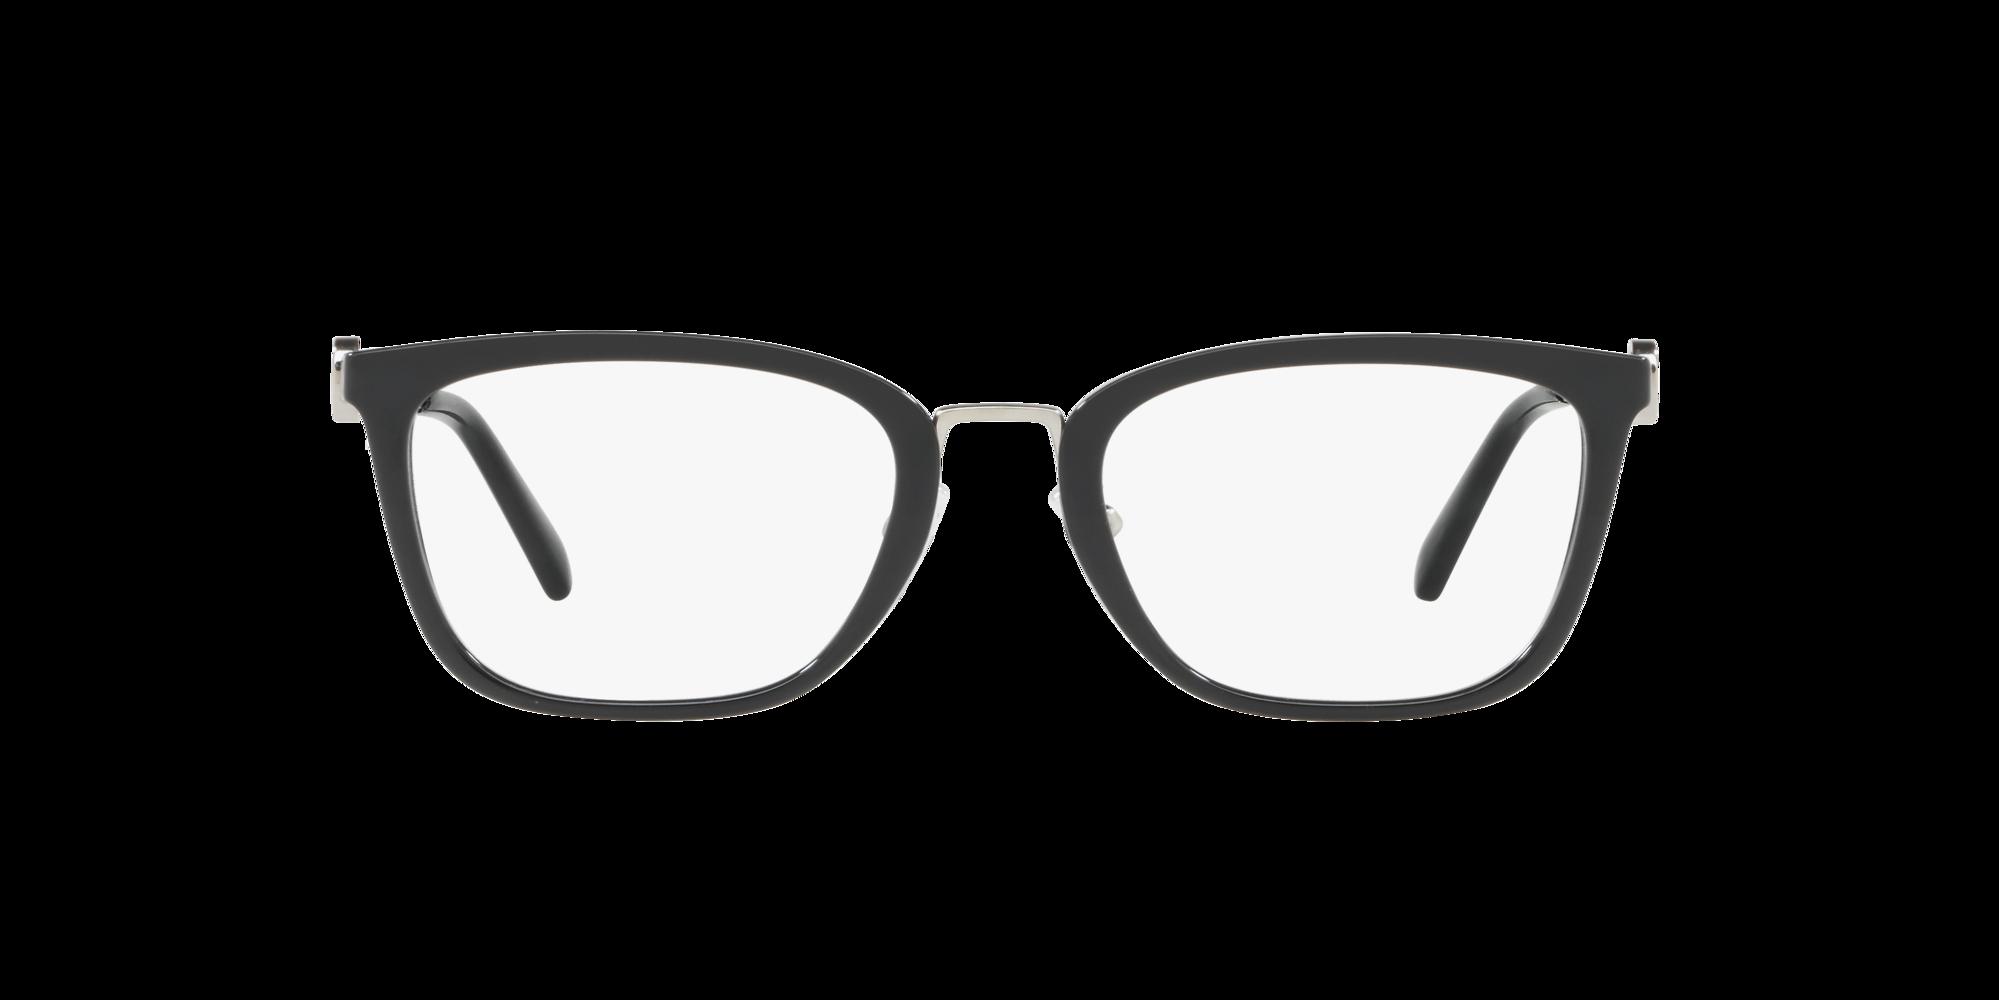 Image for MK4054 CAPTIVA from LensCrafters | Glasses, Prescription Glasses Online, Eyewear